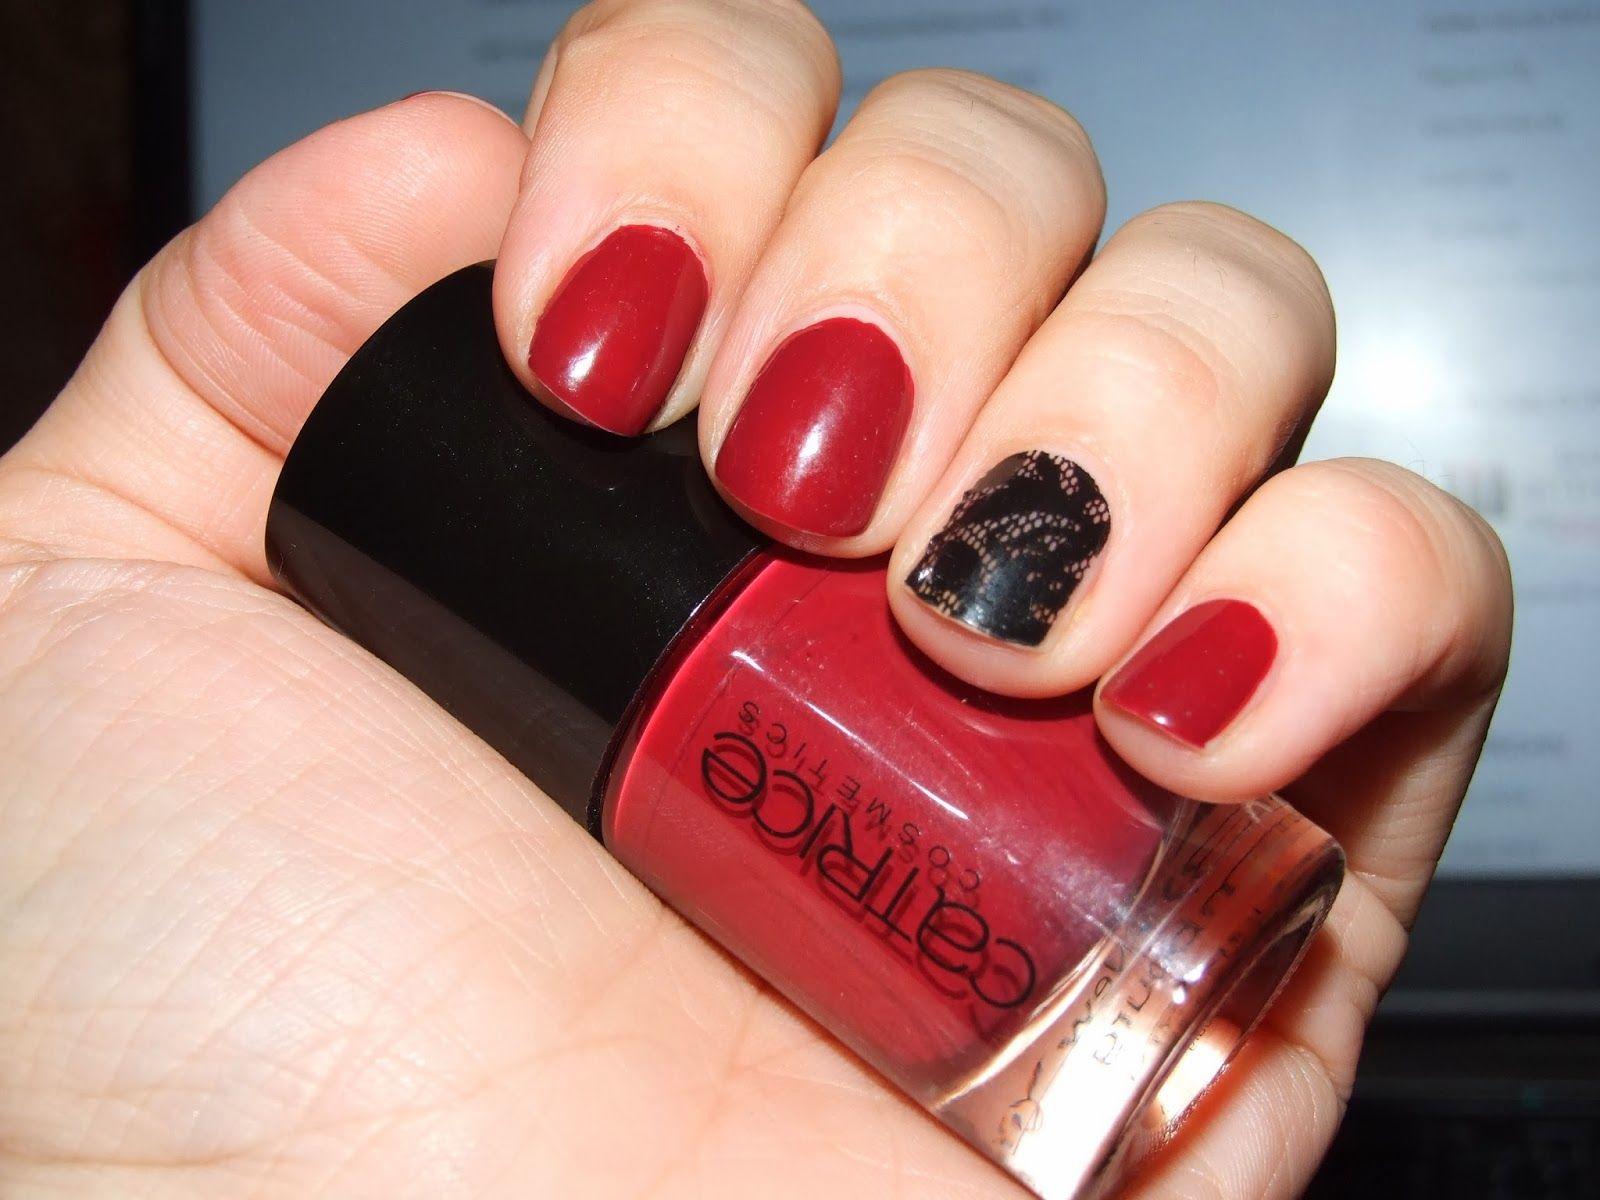 #CATRICE nail polish